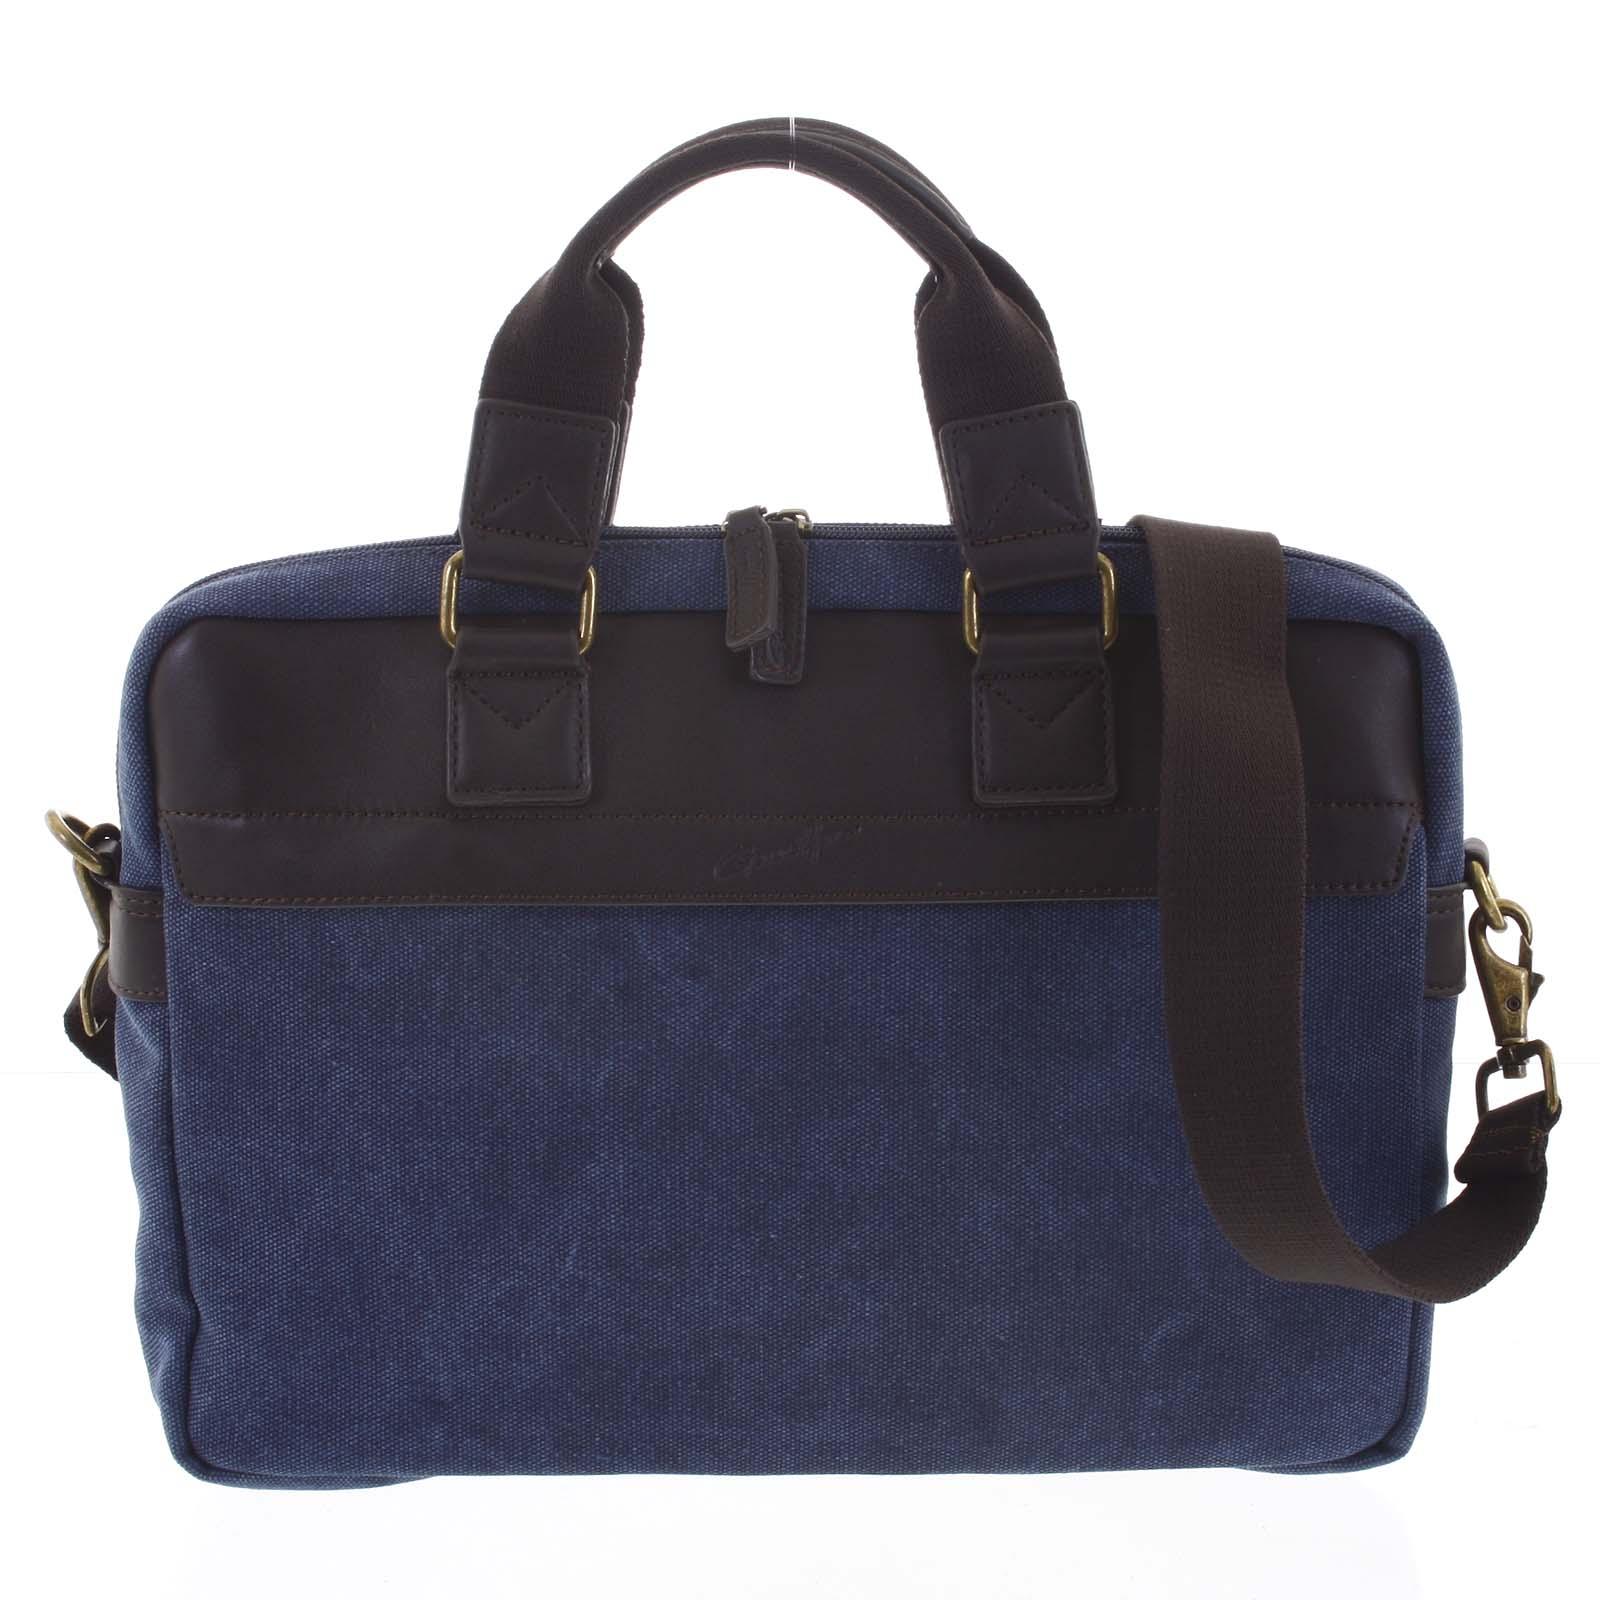 Luxusní pánská taška s koženými detaily modrá - Gerard Henon Lonel modrá